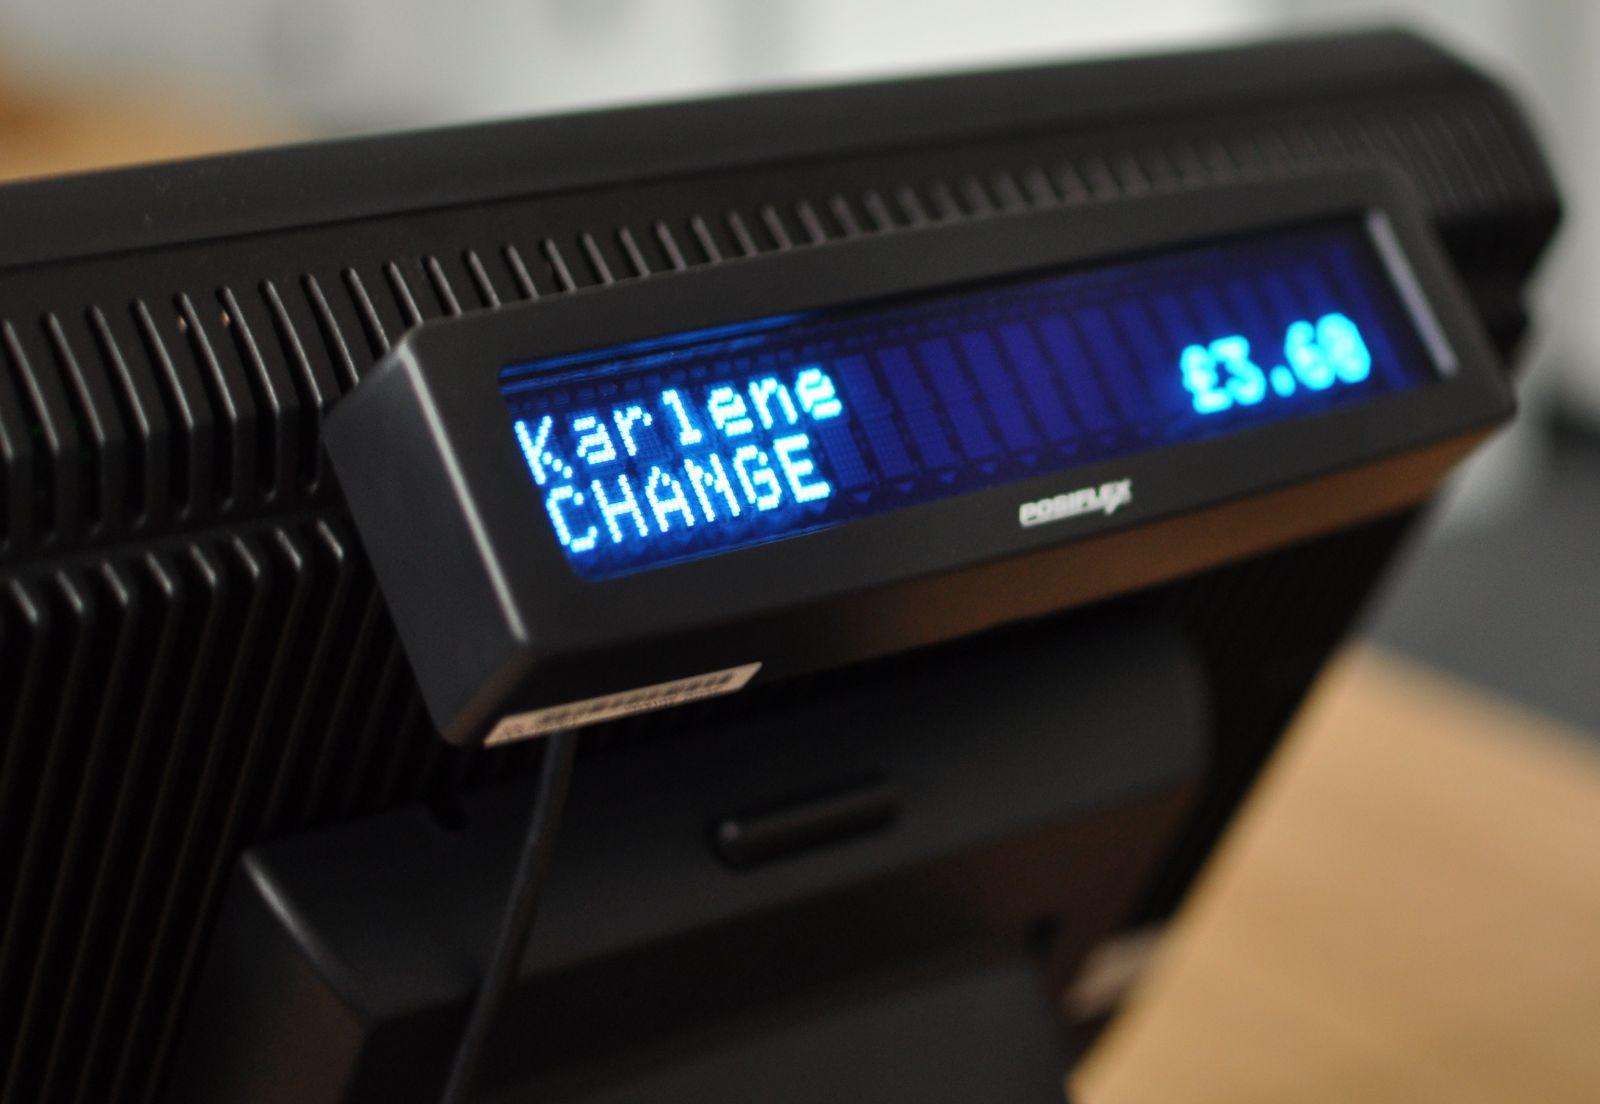 Posiflex KS-6715 Customer Display